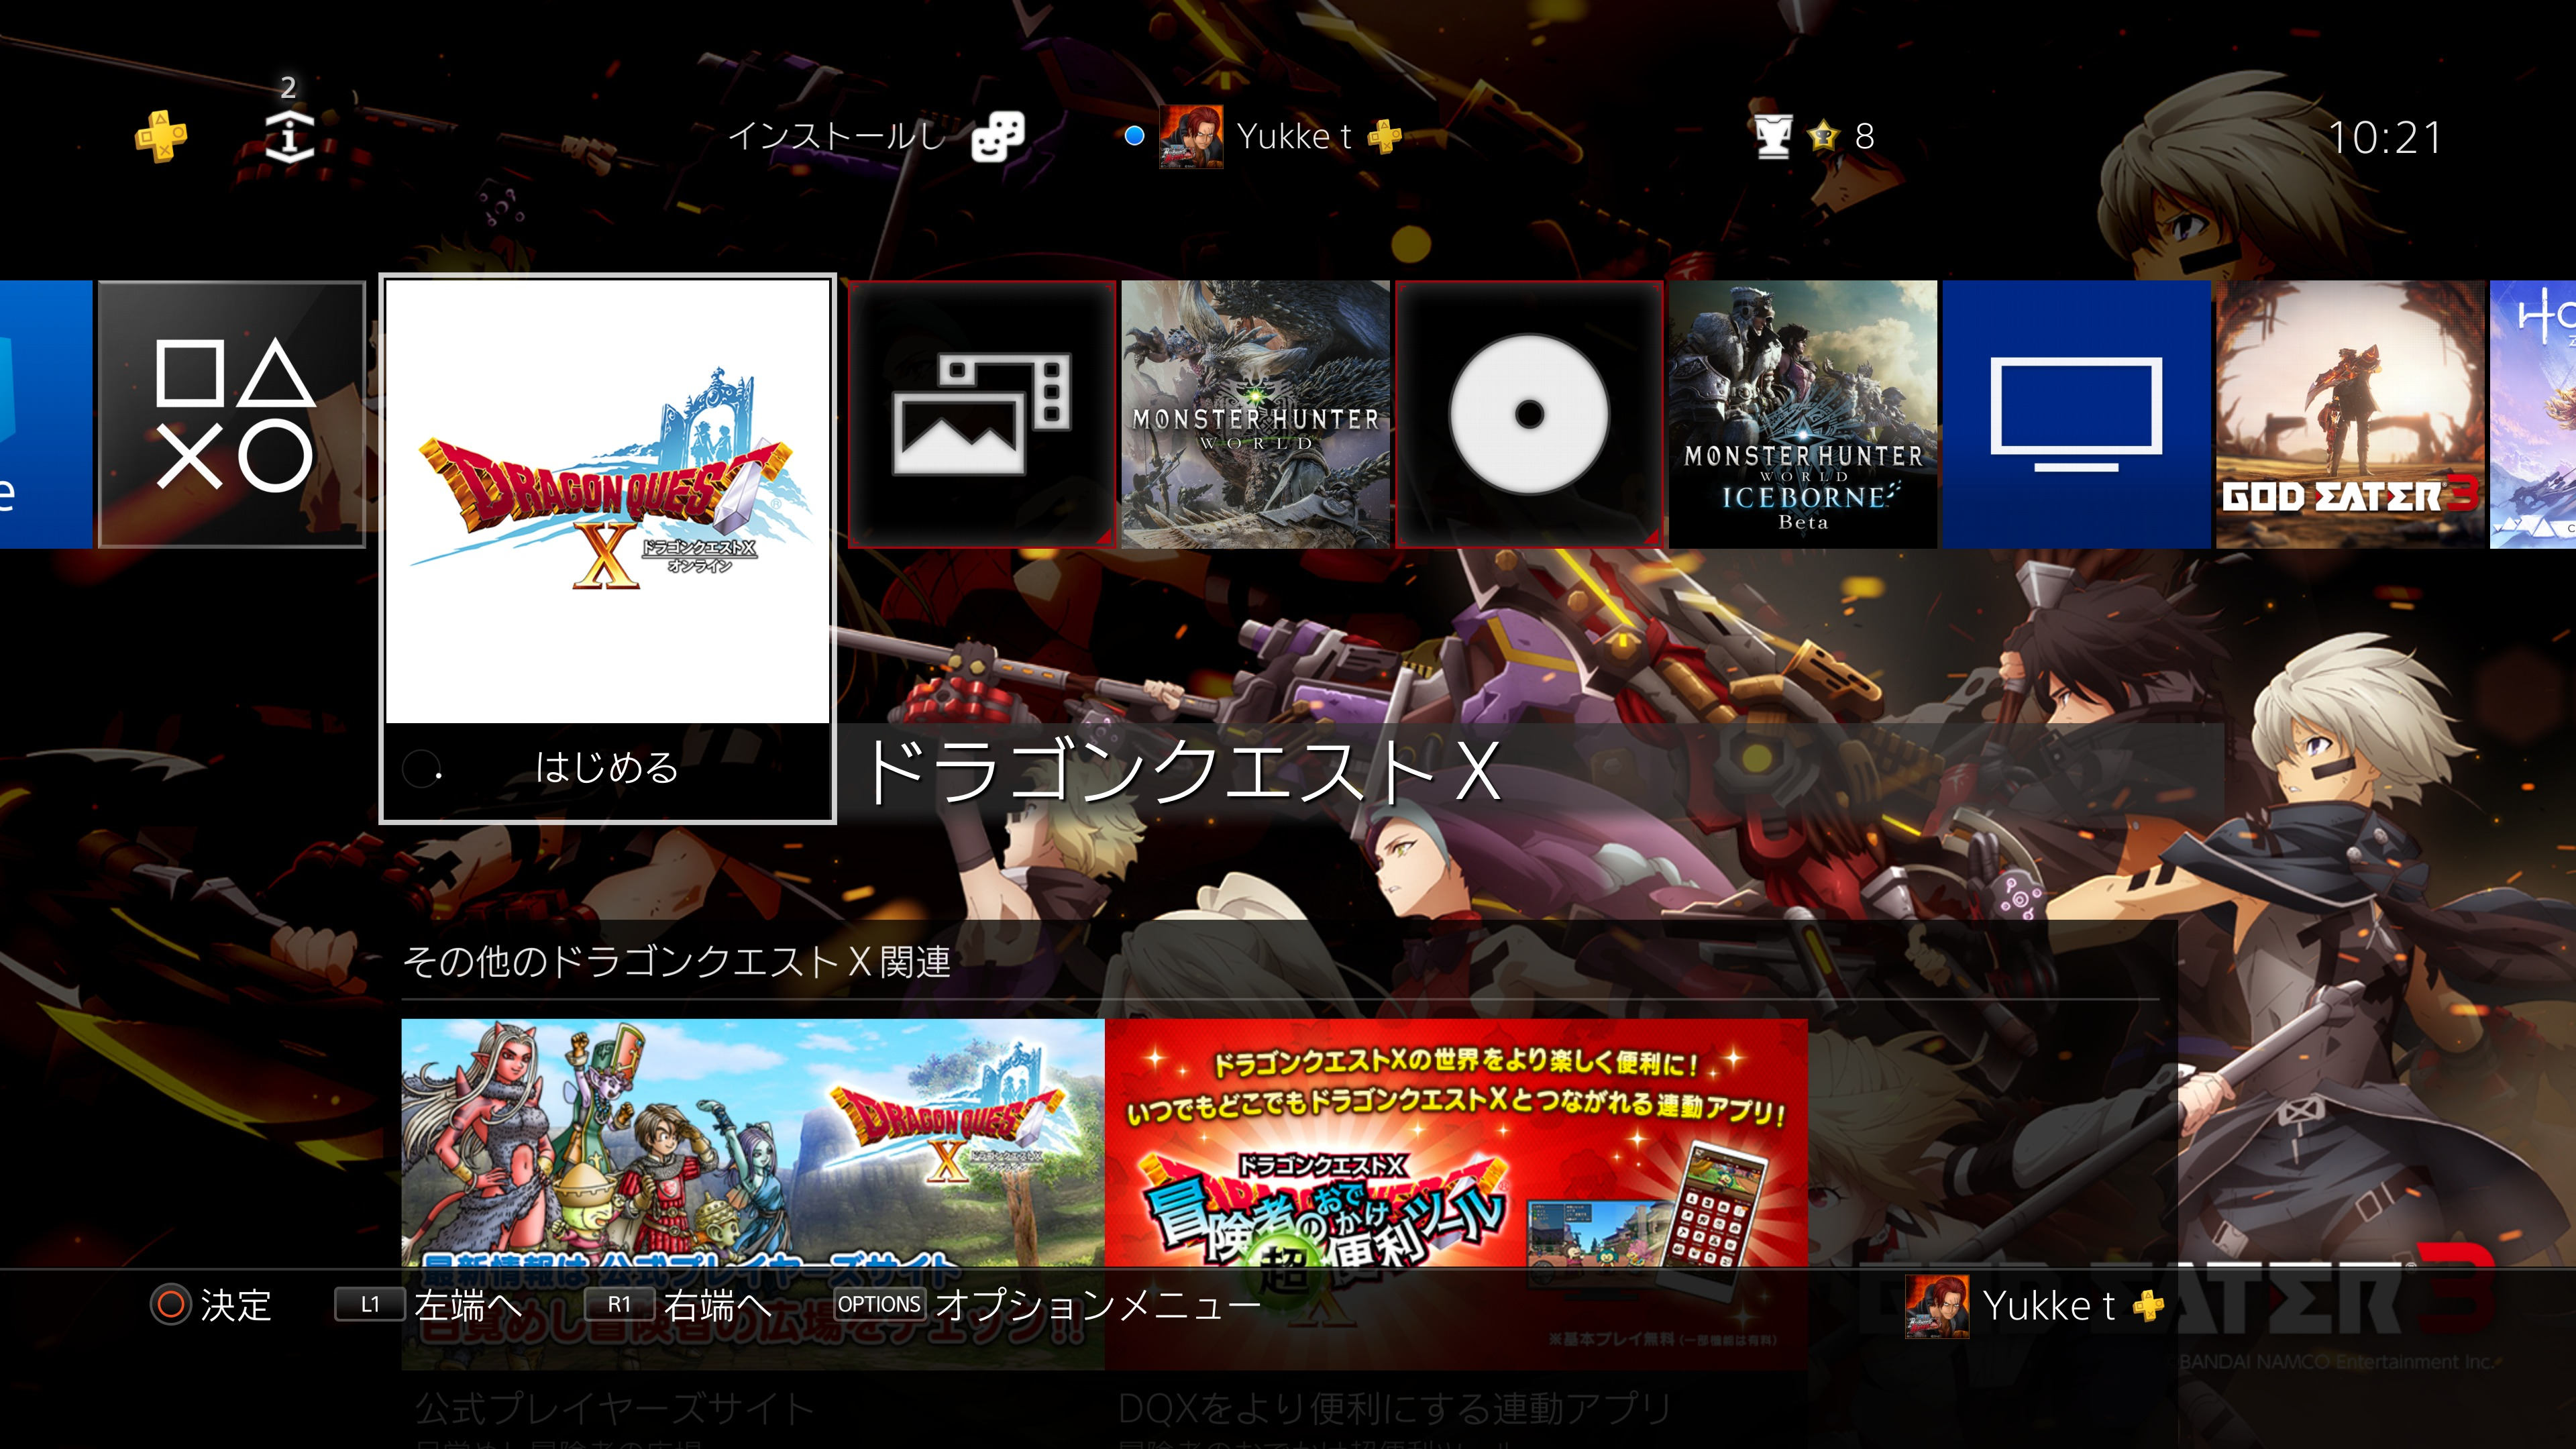 PS4メニュー画面